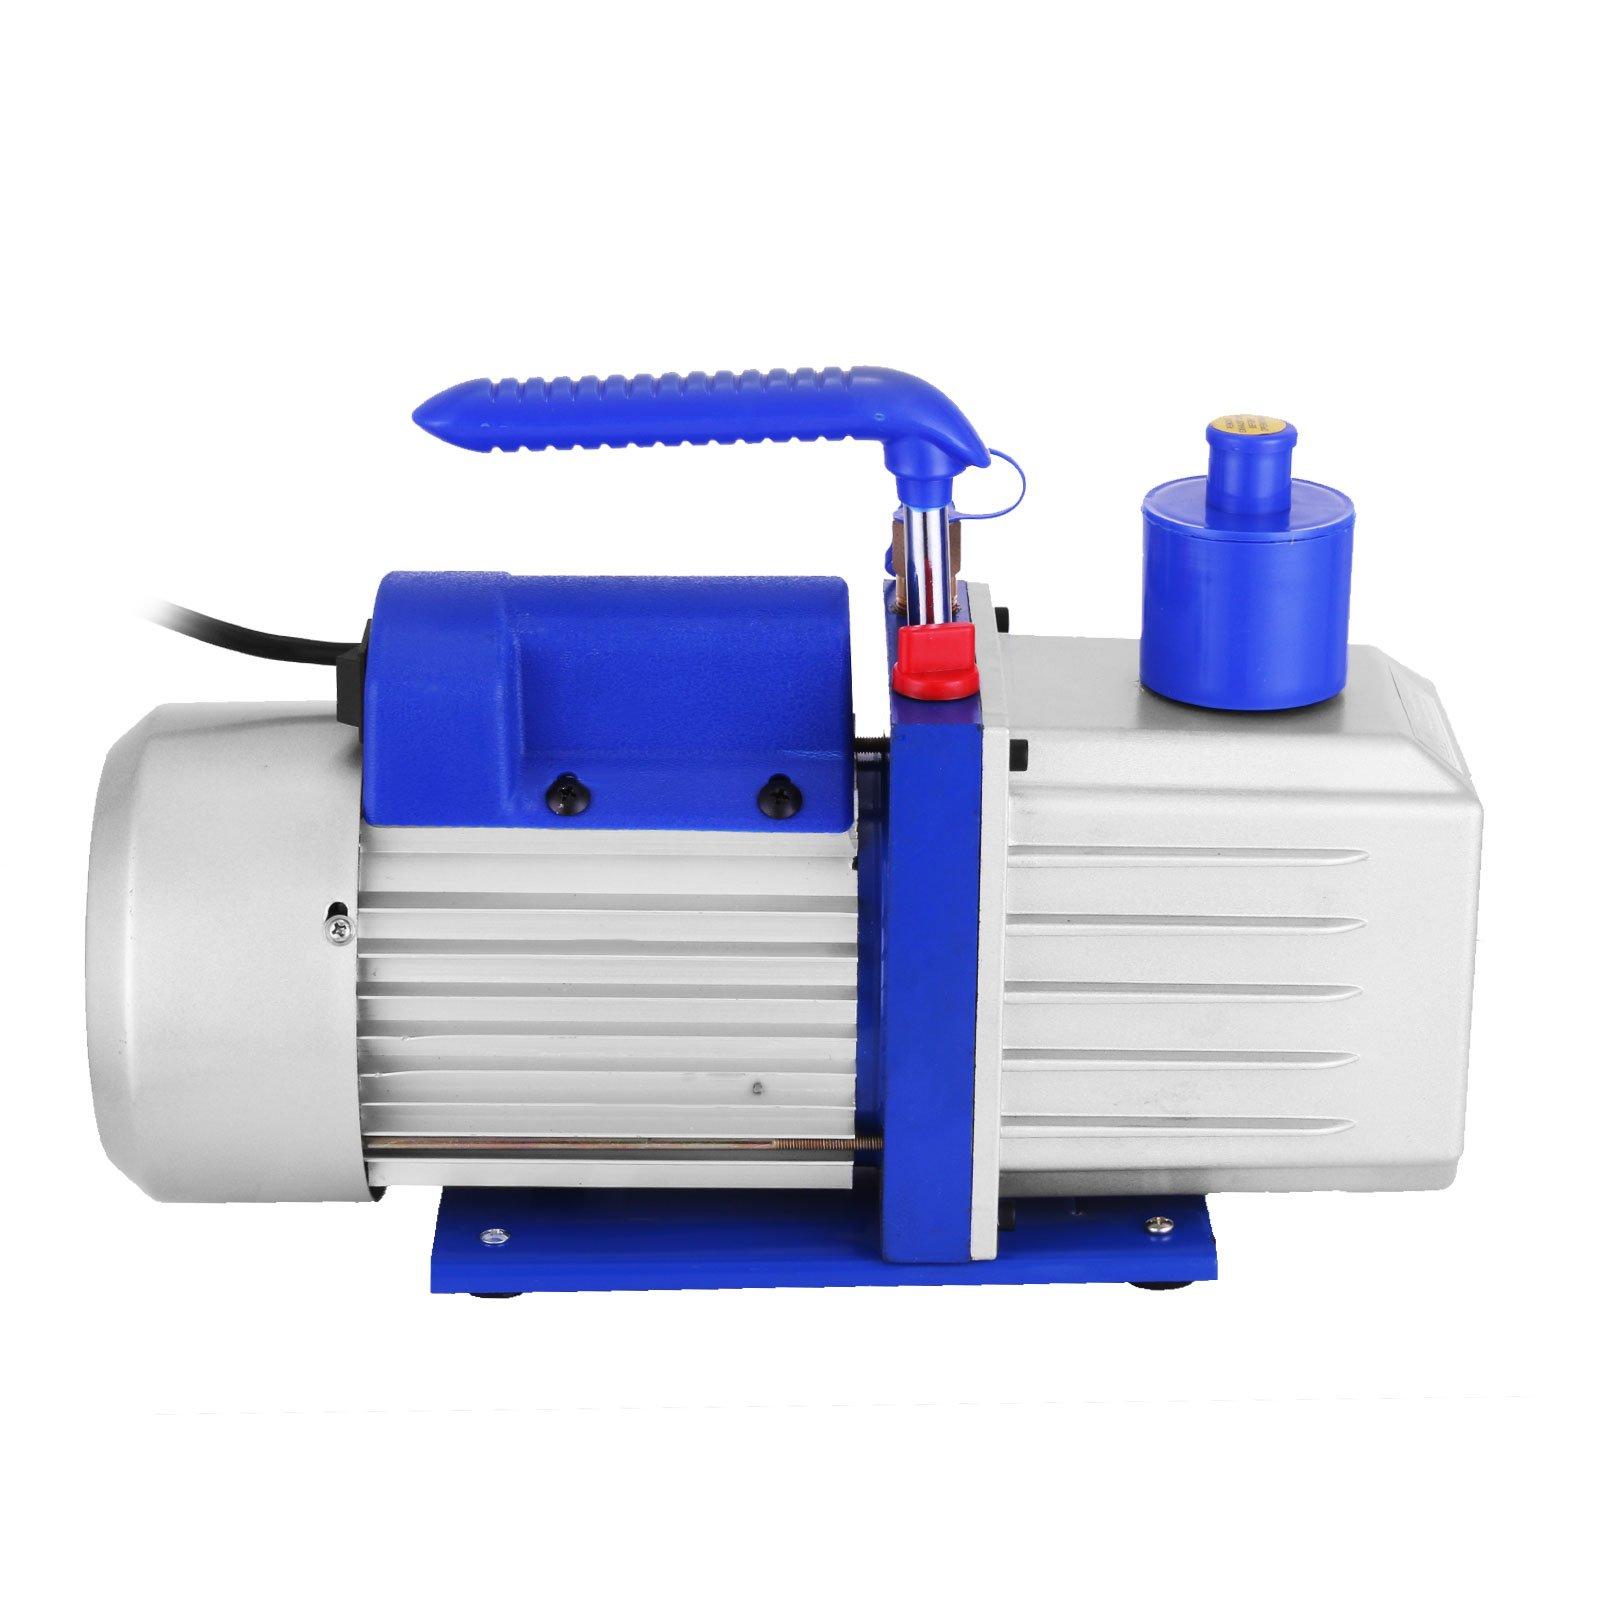 VEVOR Vacuum Pump 9CFM 1HP Two Stage HVAC Rotary Vane Vacuum Pump Wine Degassing Milking Medical Food Processing Air Conditioning Auto AC Refrigerant Vacuum Pump (2-Stage, 9CFM) by VEVOR (Image #3)